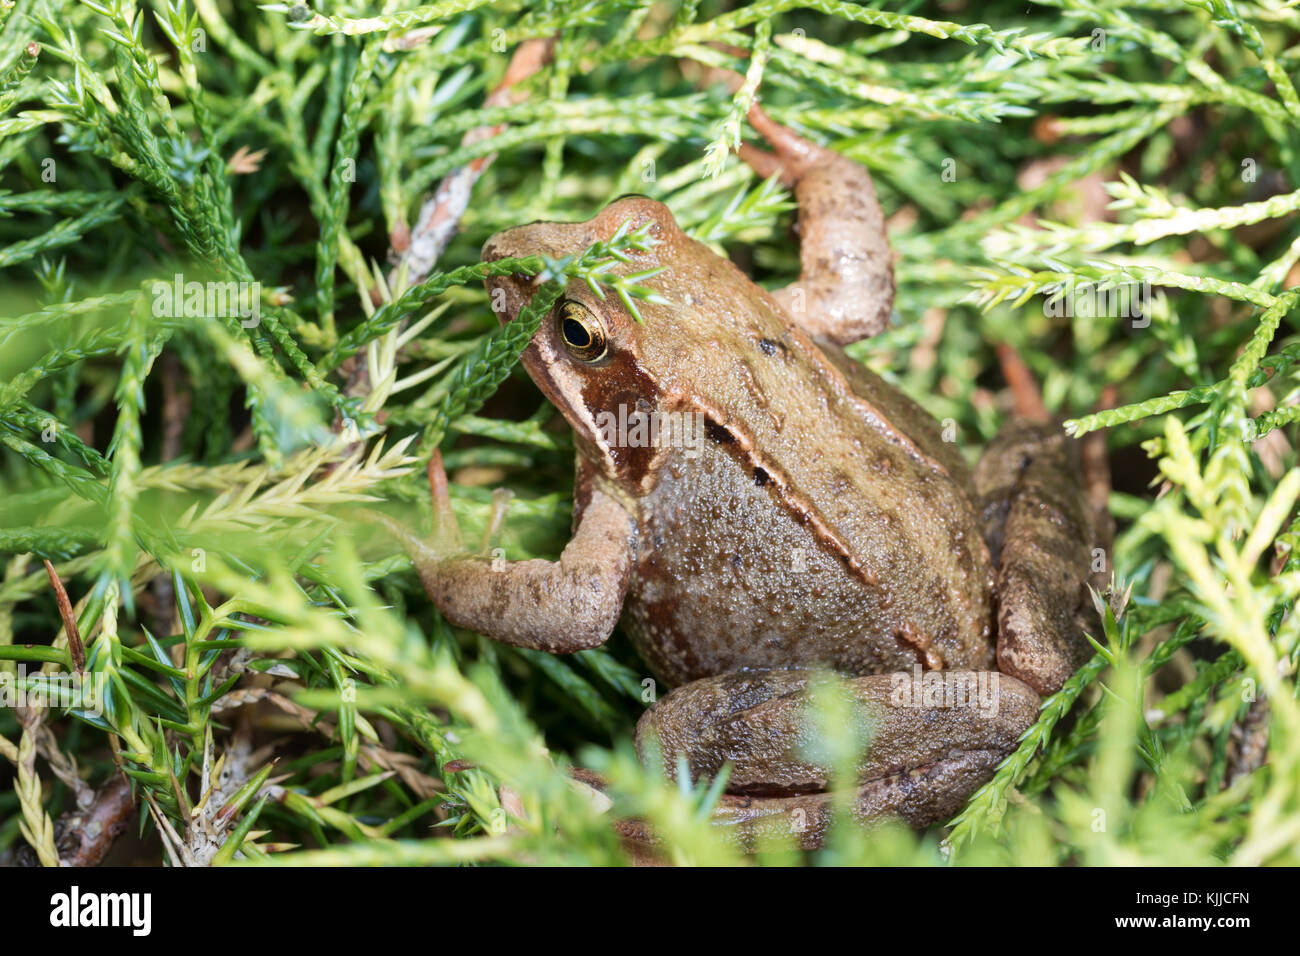 Wildlife: Common frog. (Rana temporaria). - Stock Image